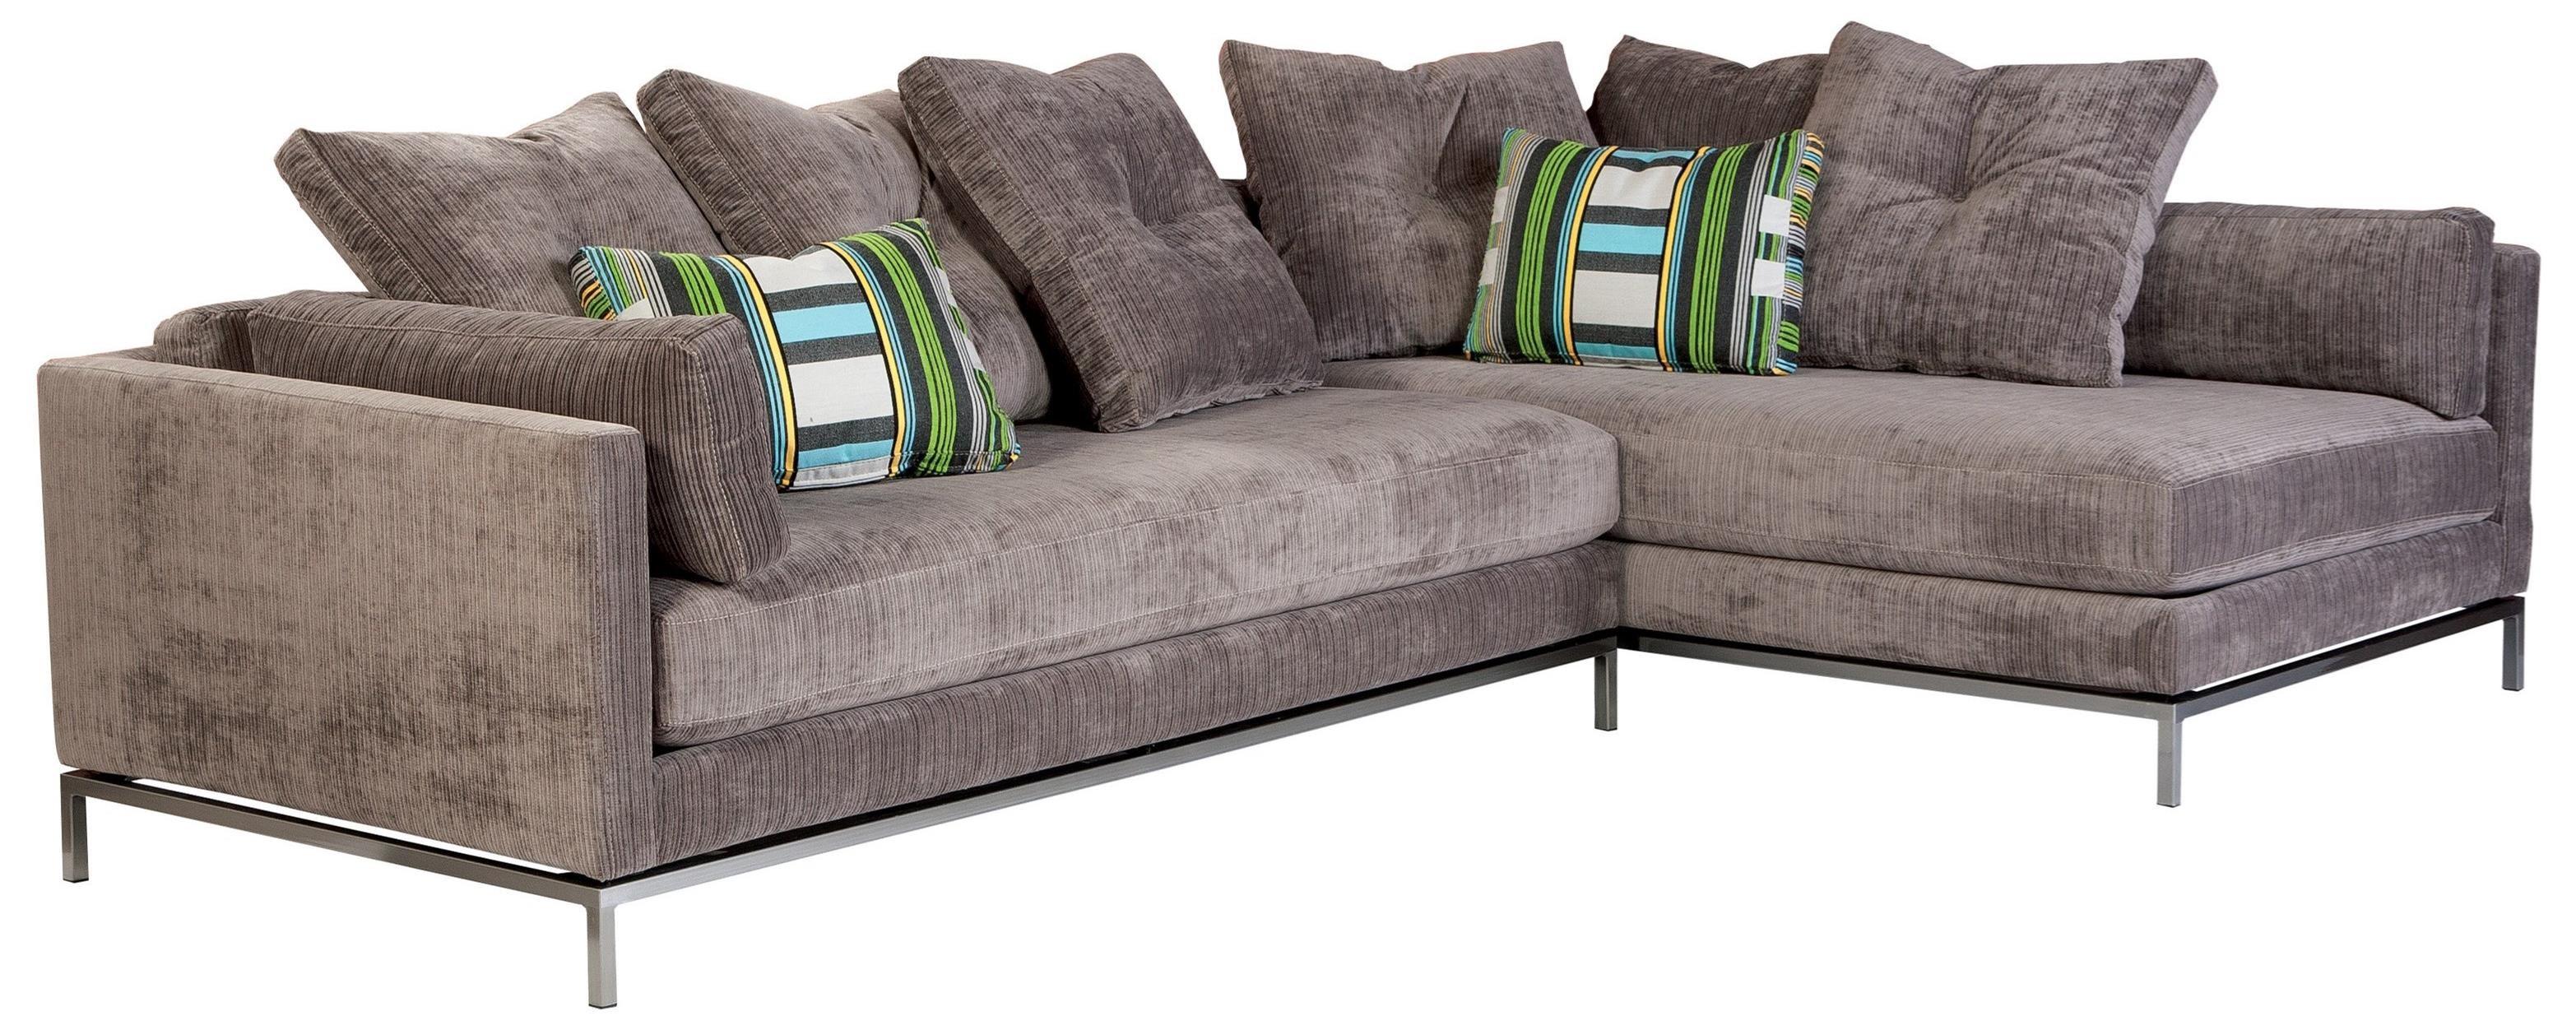 Merveilleux Jonathan Louis CordobaSectional Sofa